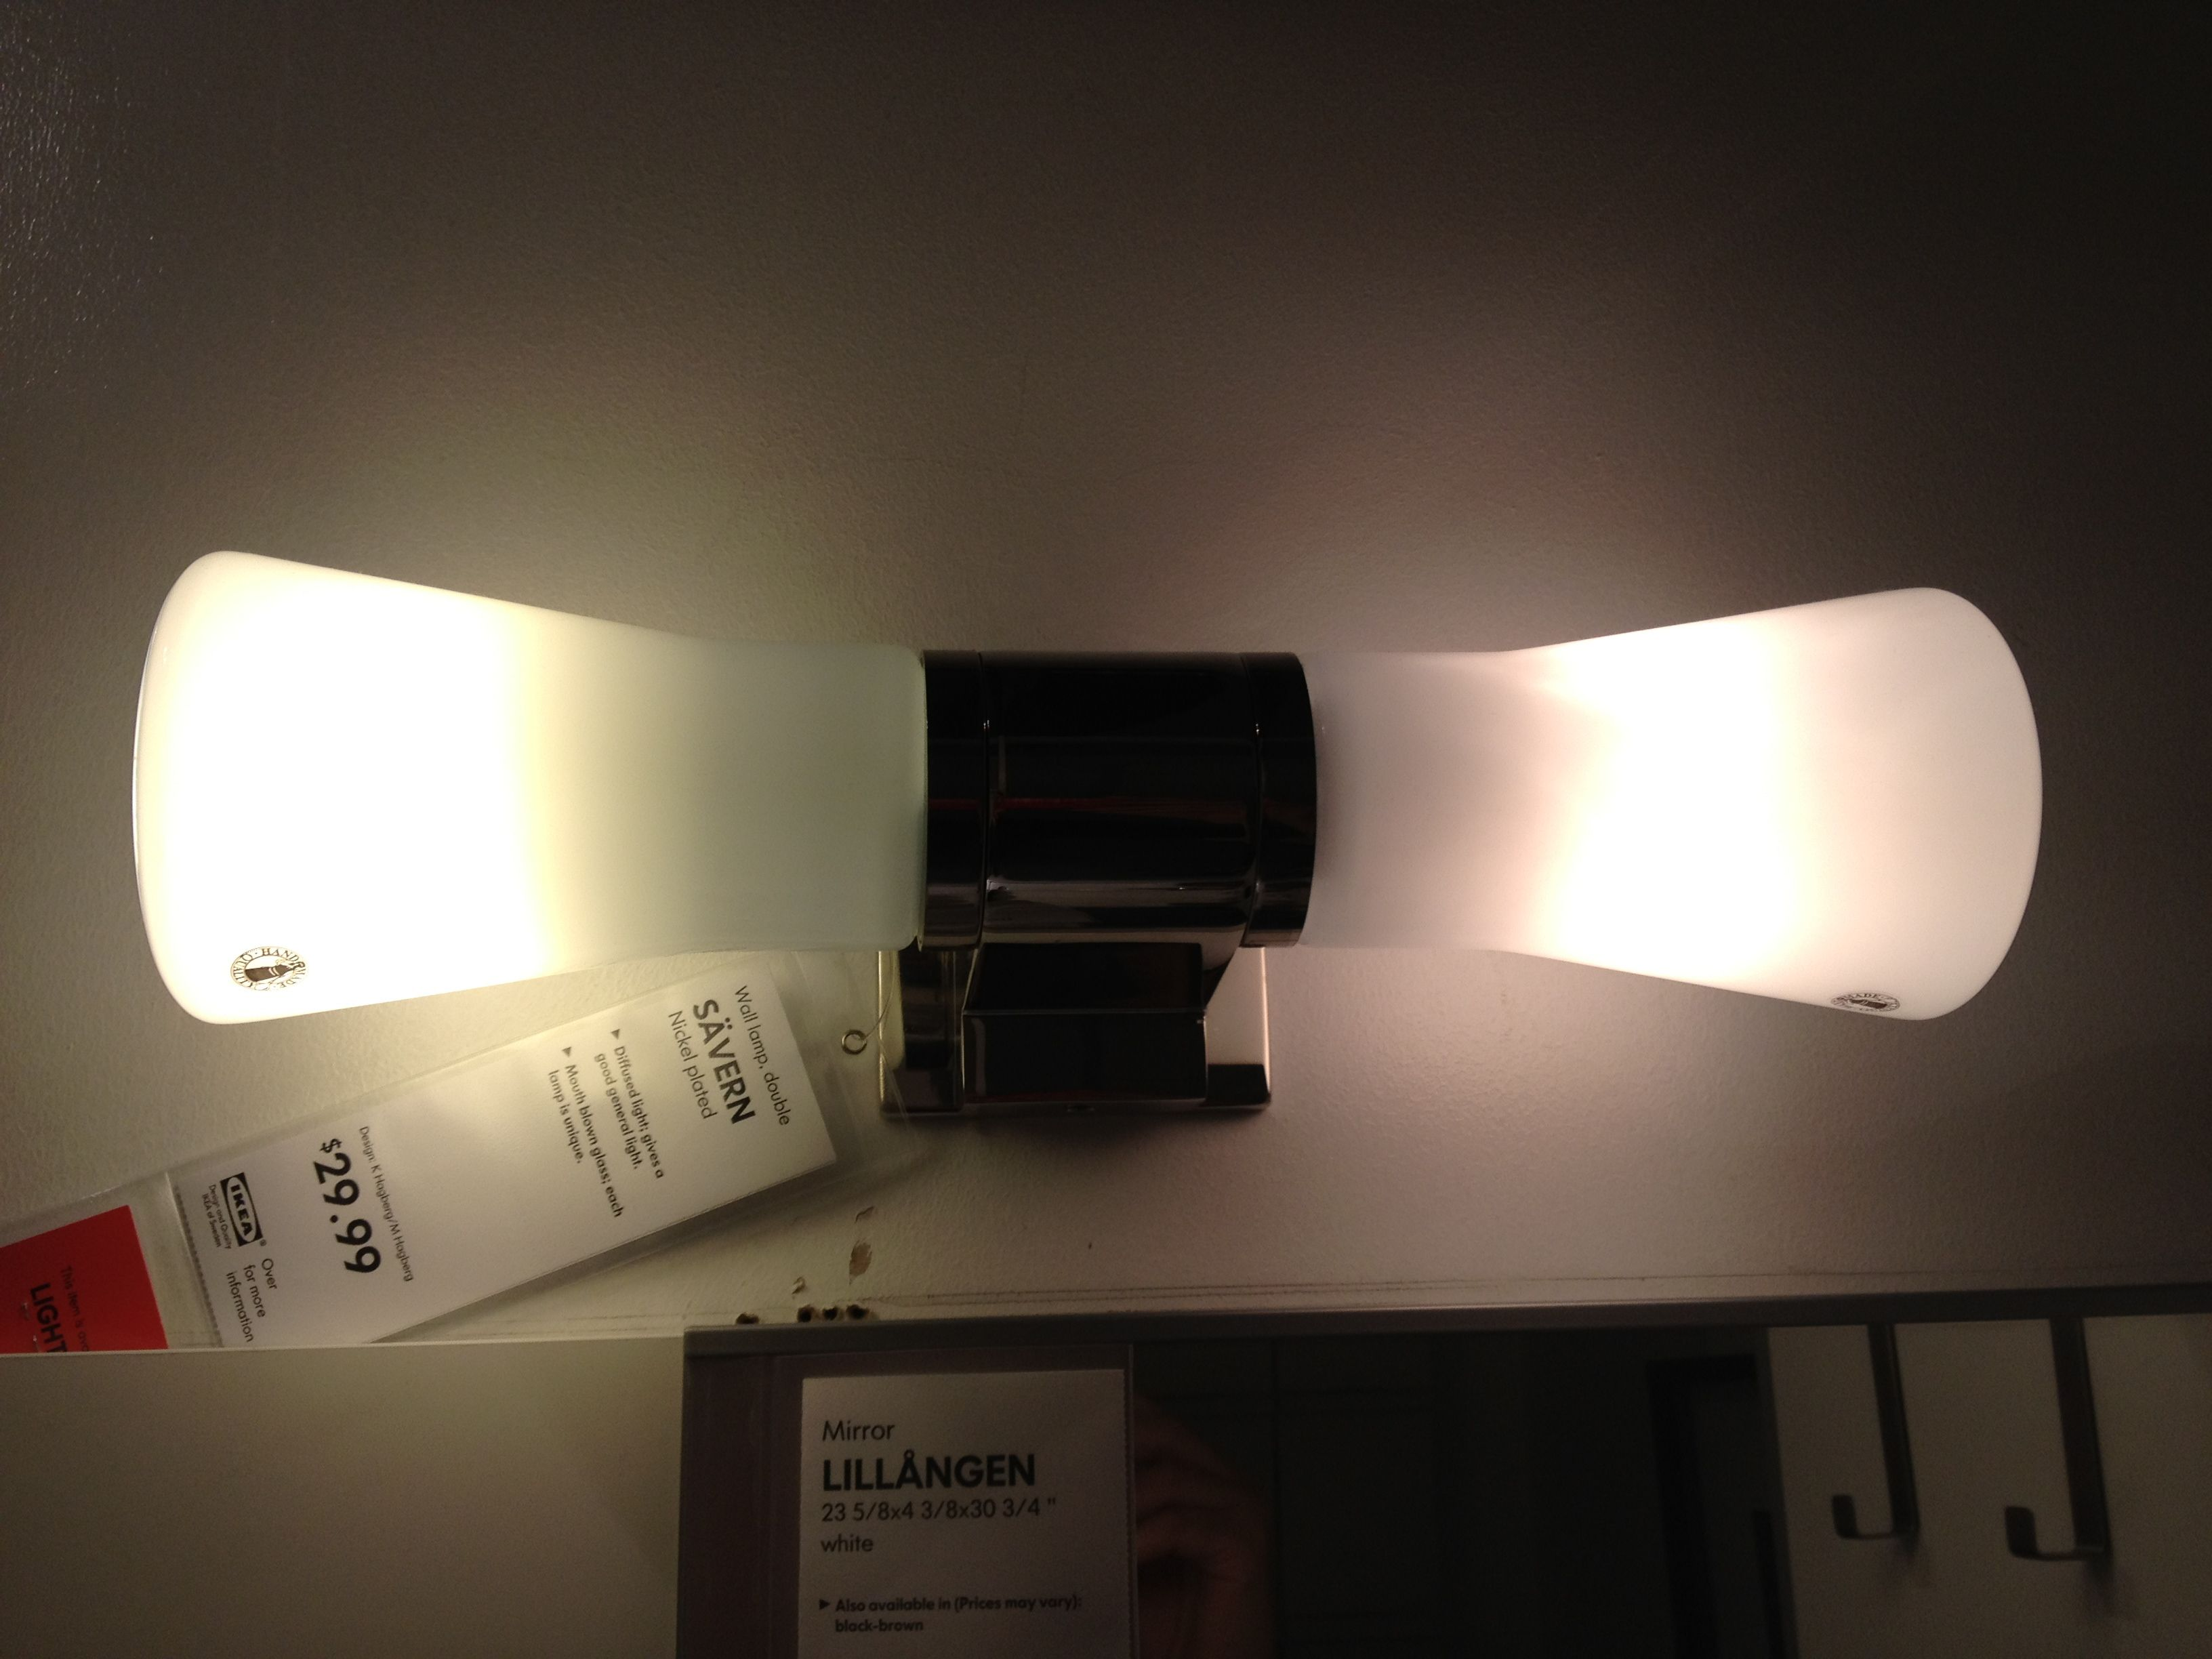 Bathroom Lighting Ikea ikea bathroom light | bathrooms | pinterest | ikea bathroom